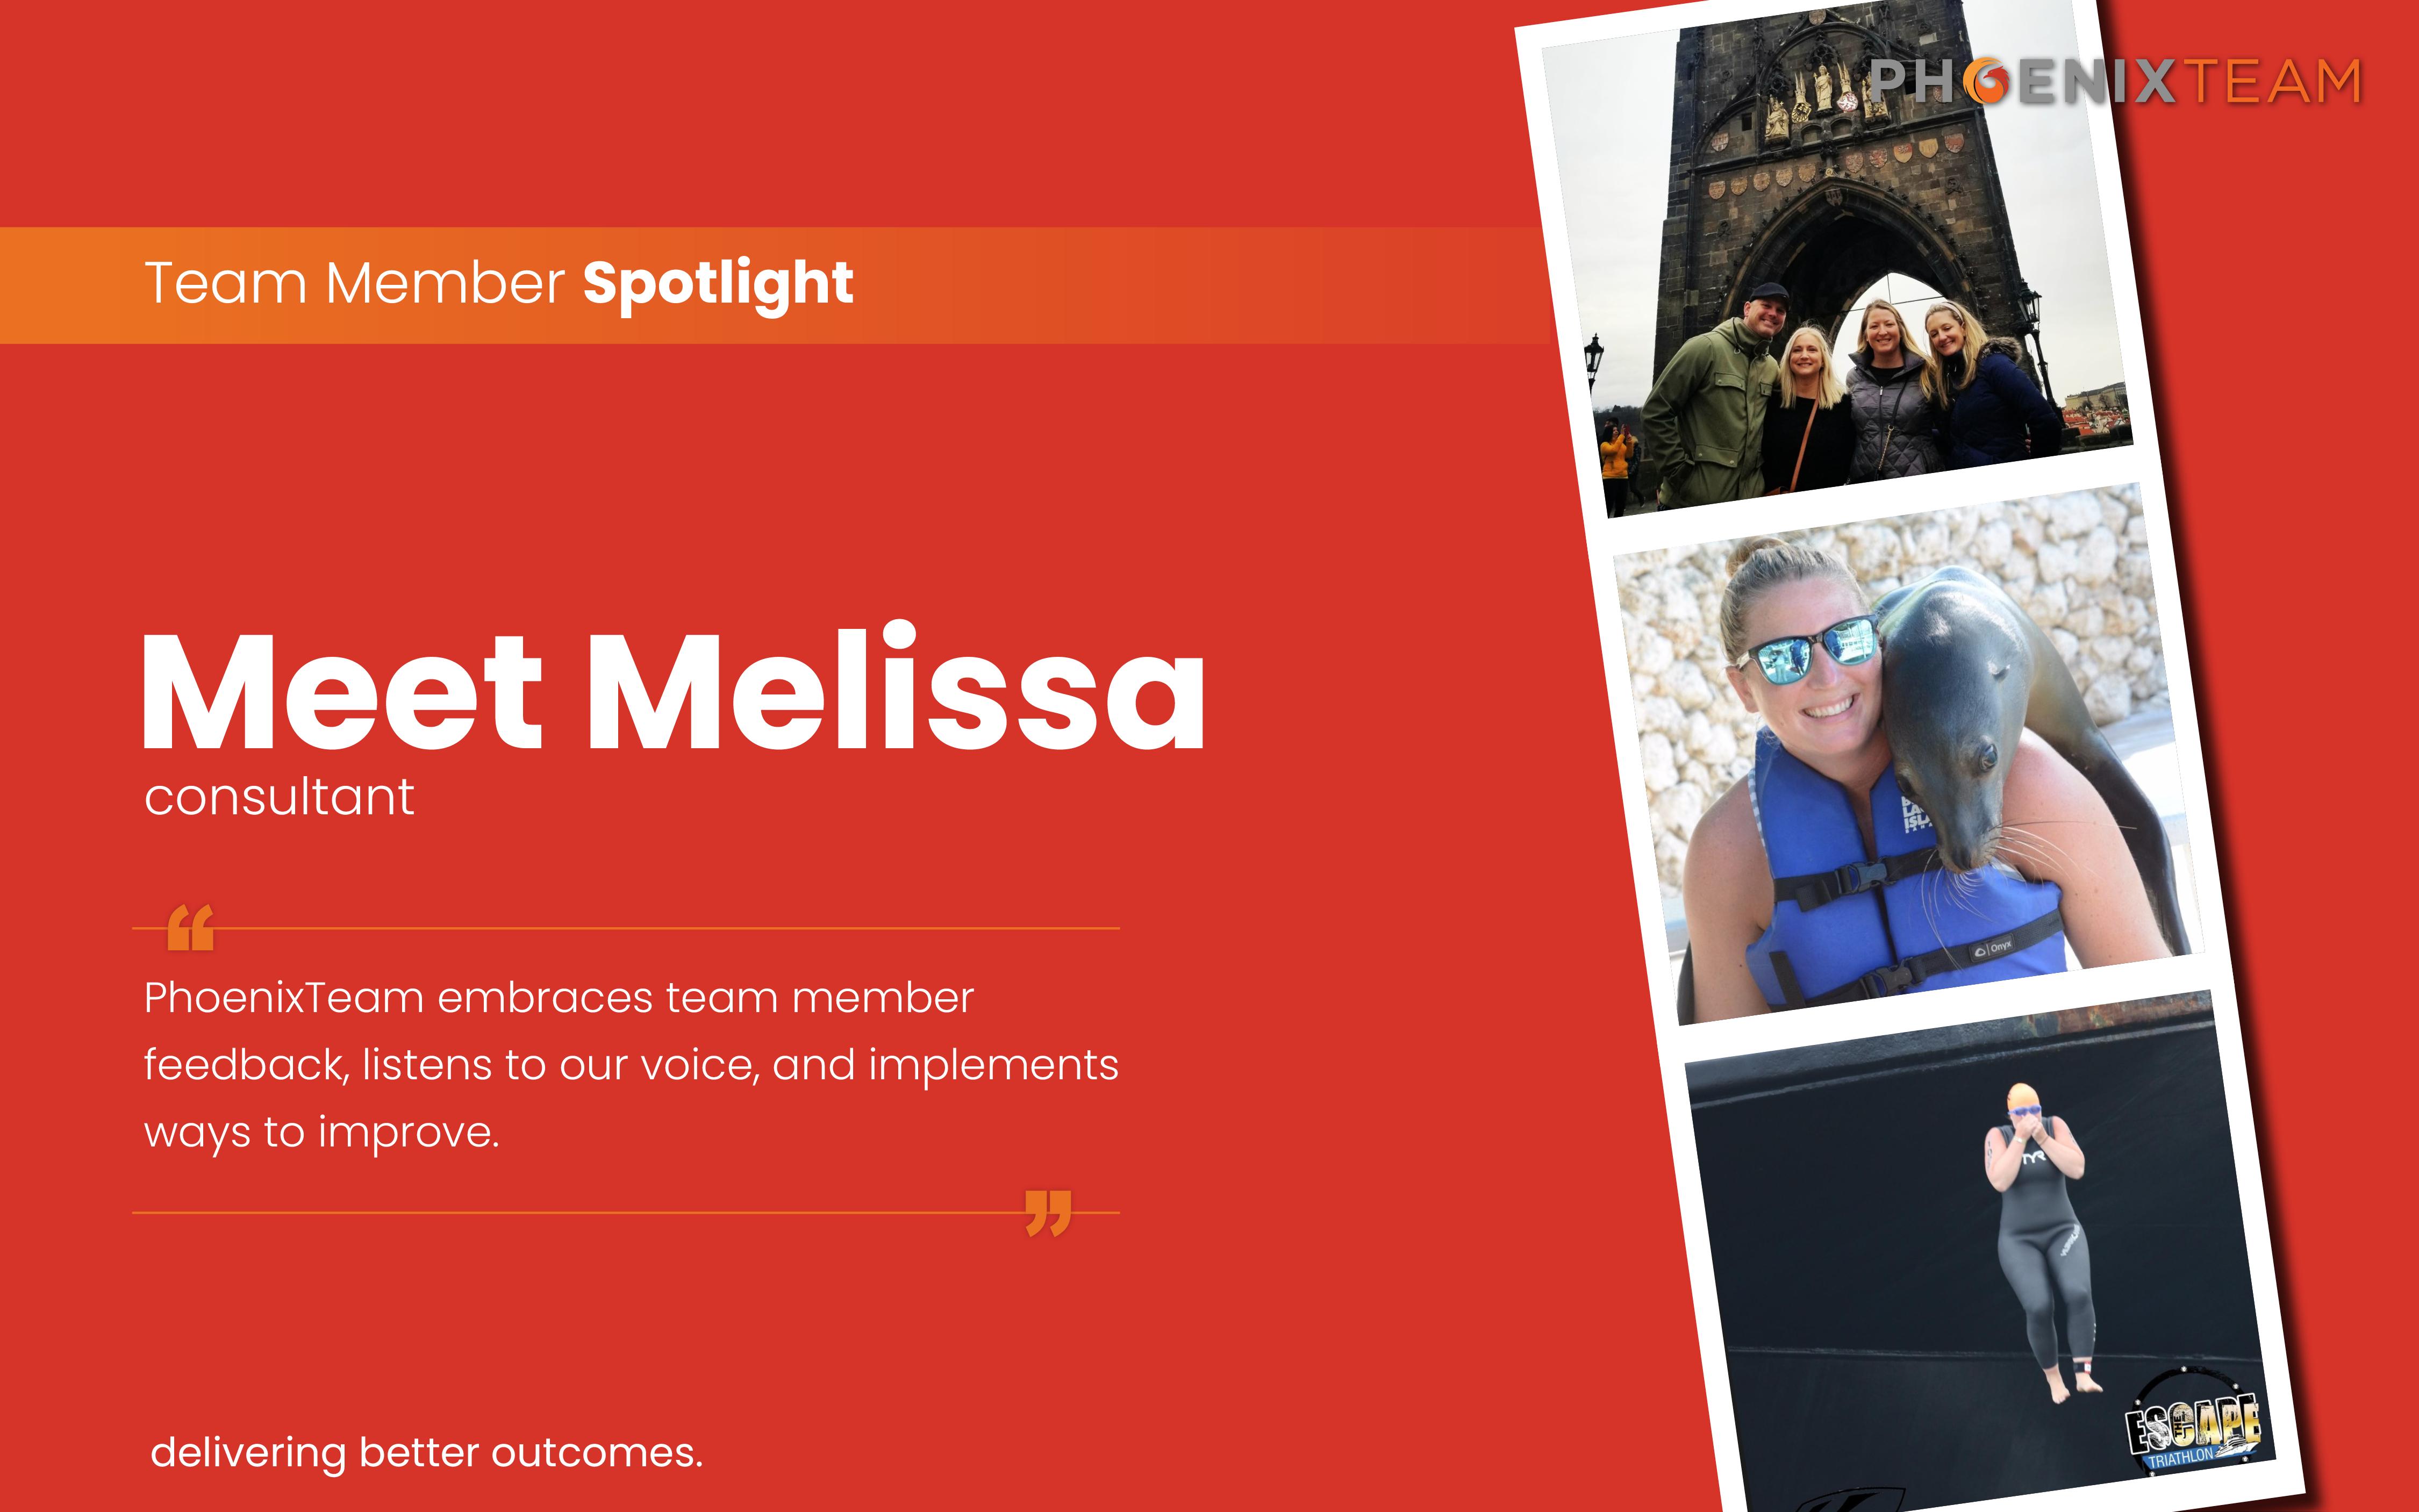 PhoenixTeam Employee Spotlight Graphic – Melissa v2